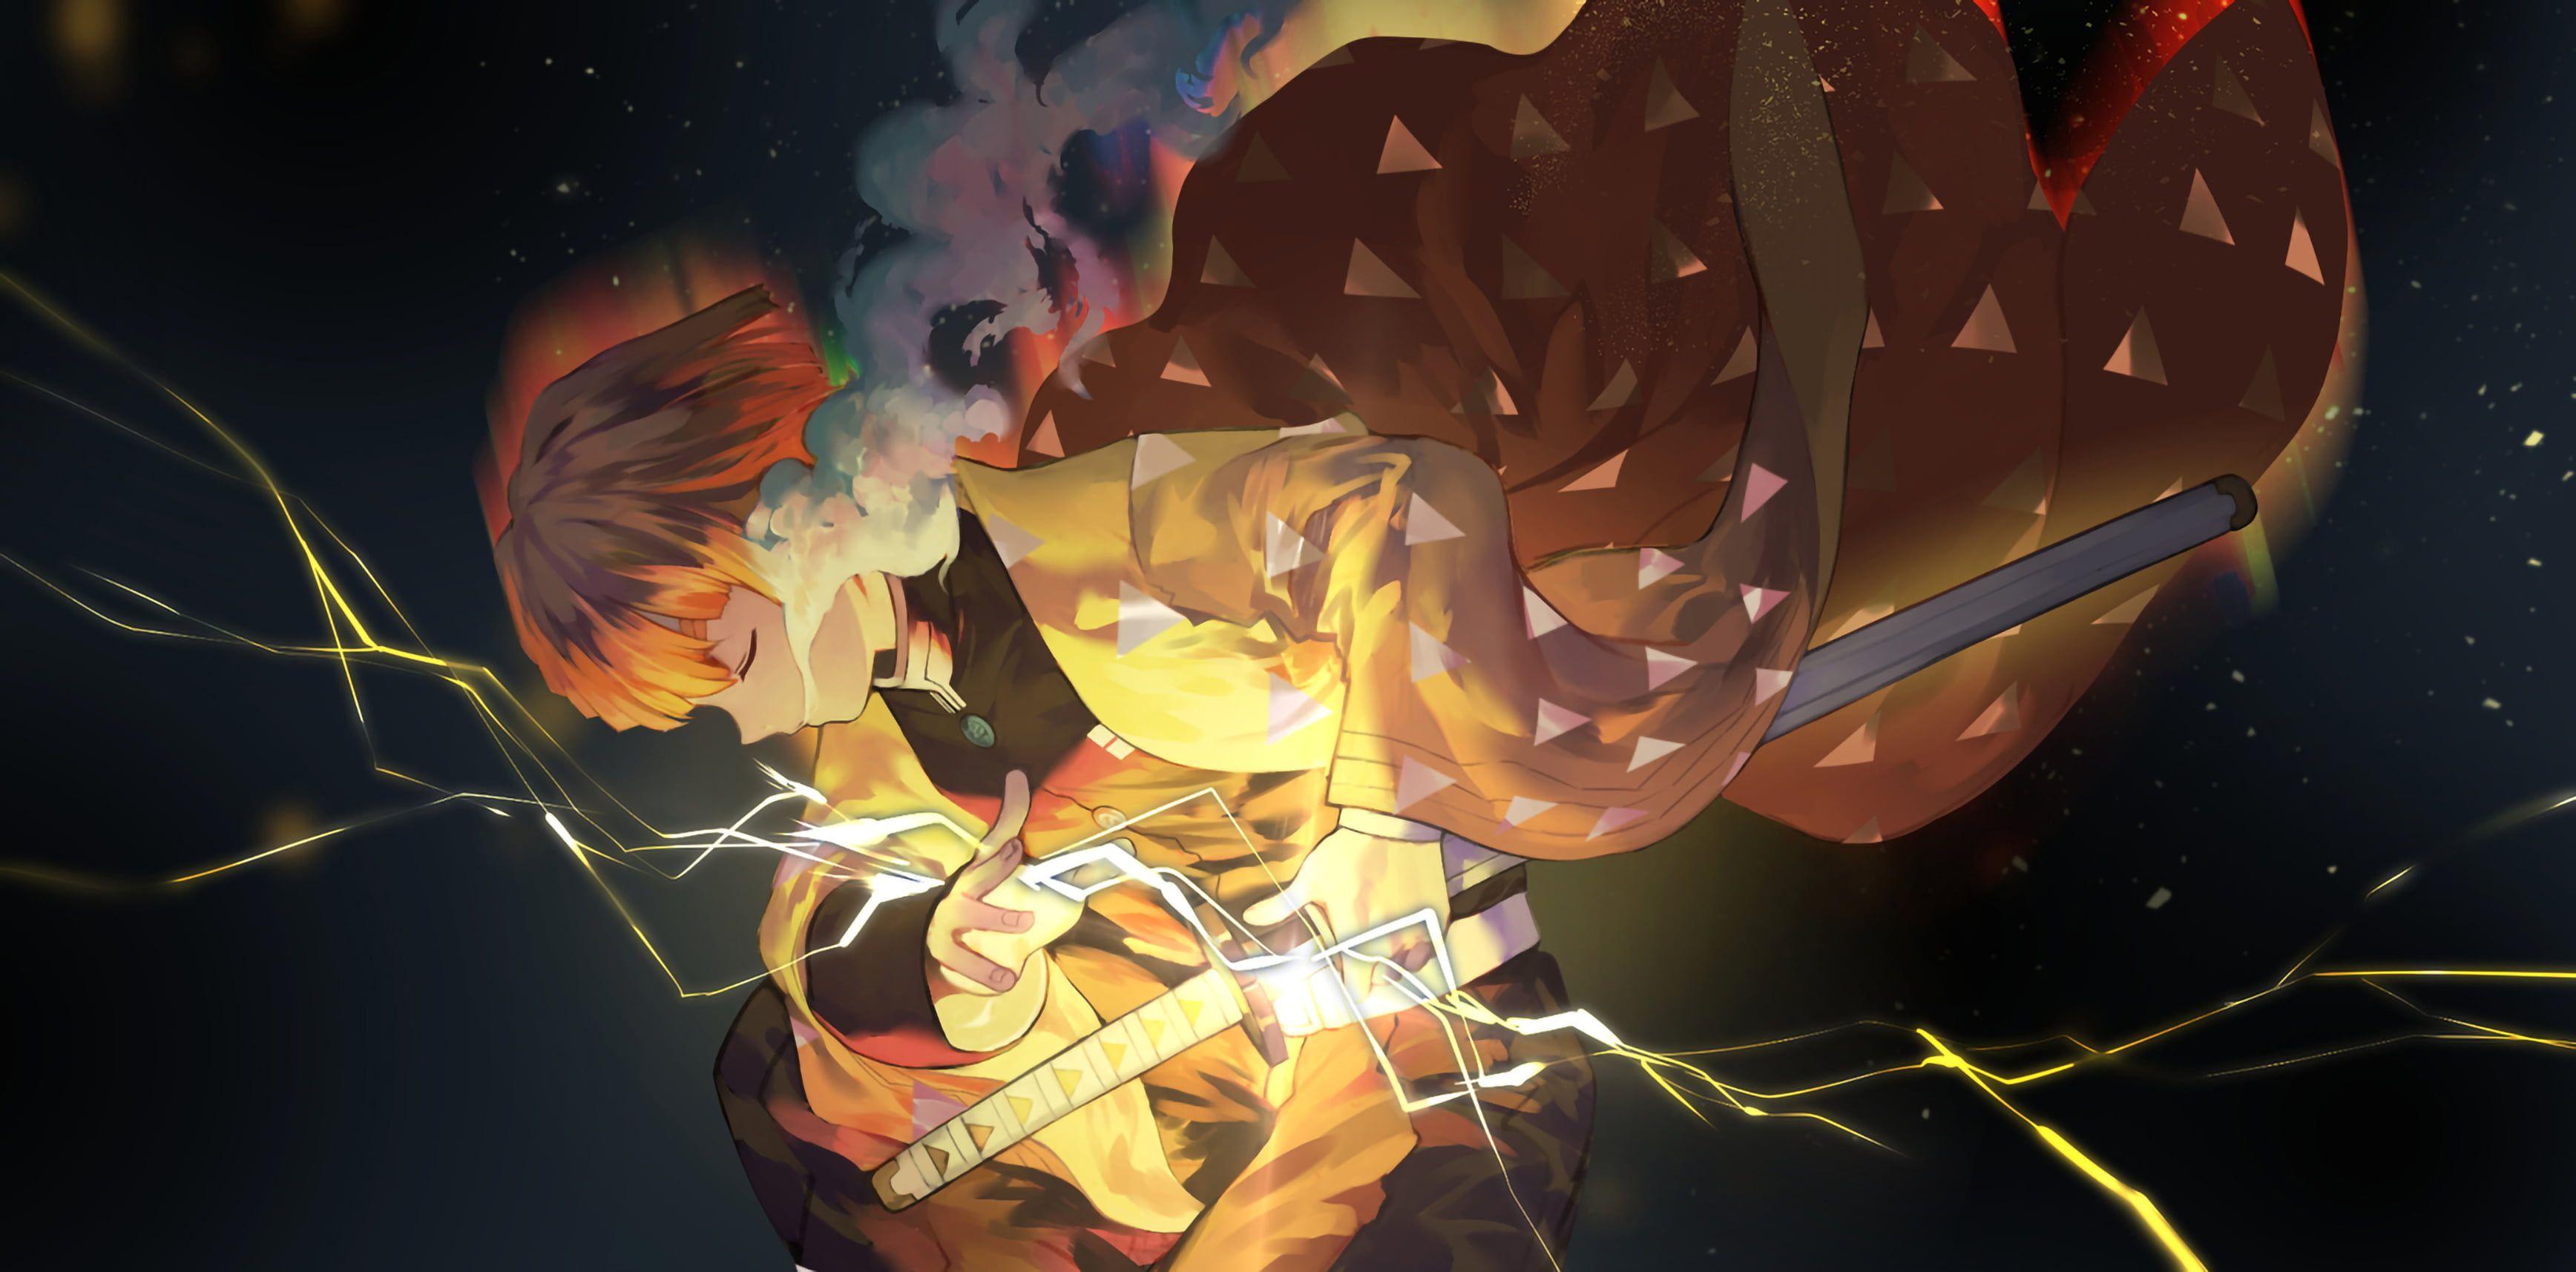 Anime Demon Slayer Kimetsu No Yaiba Zenitsu Agatsuma 2k Wallpaper Hdwallpaper Desktop In 2020 Anime Wallpaper Live Anime Images Anime Wallpaper